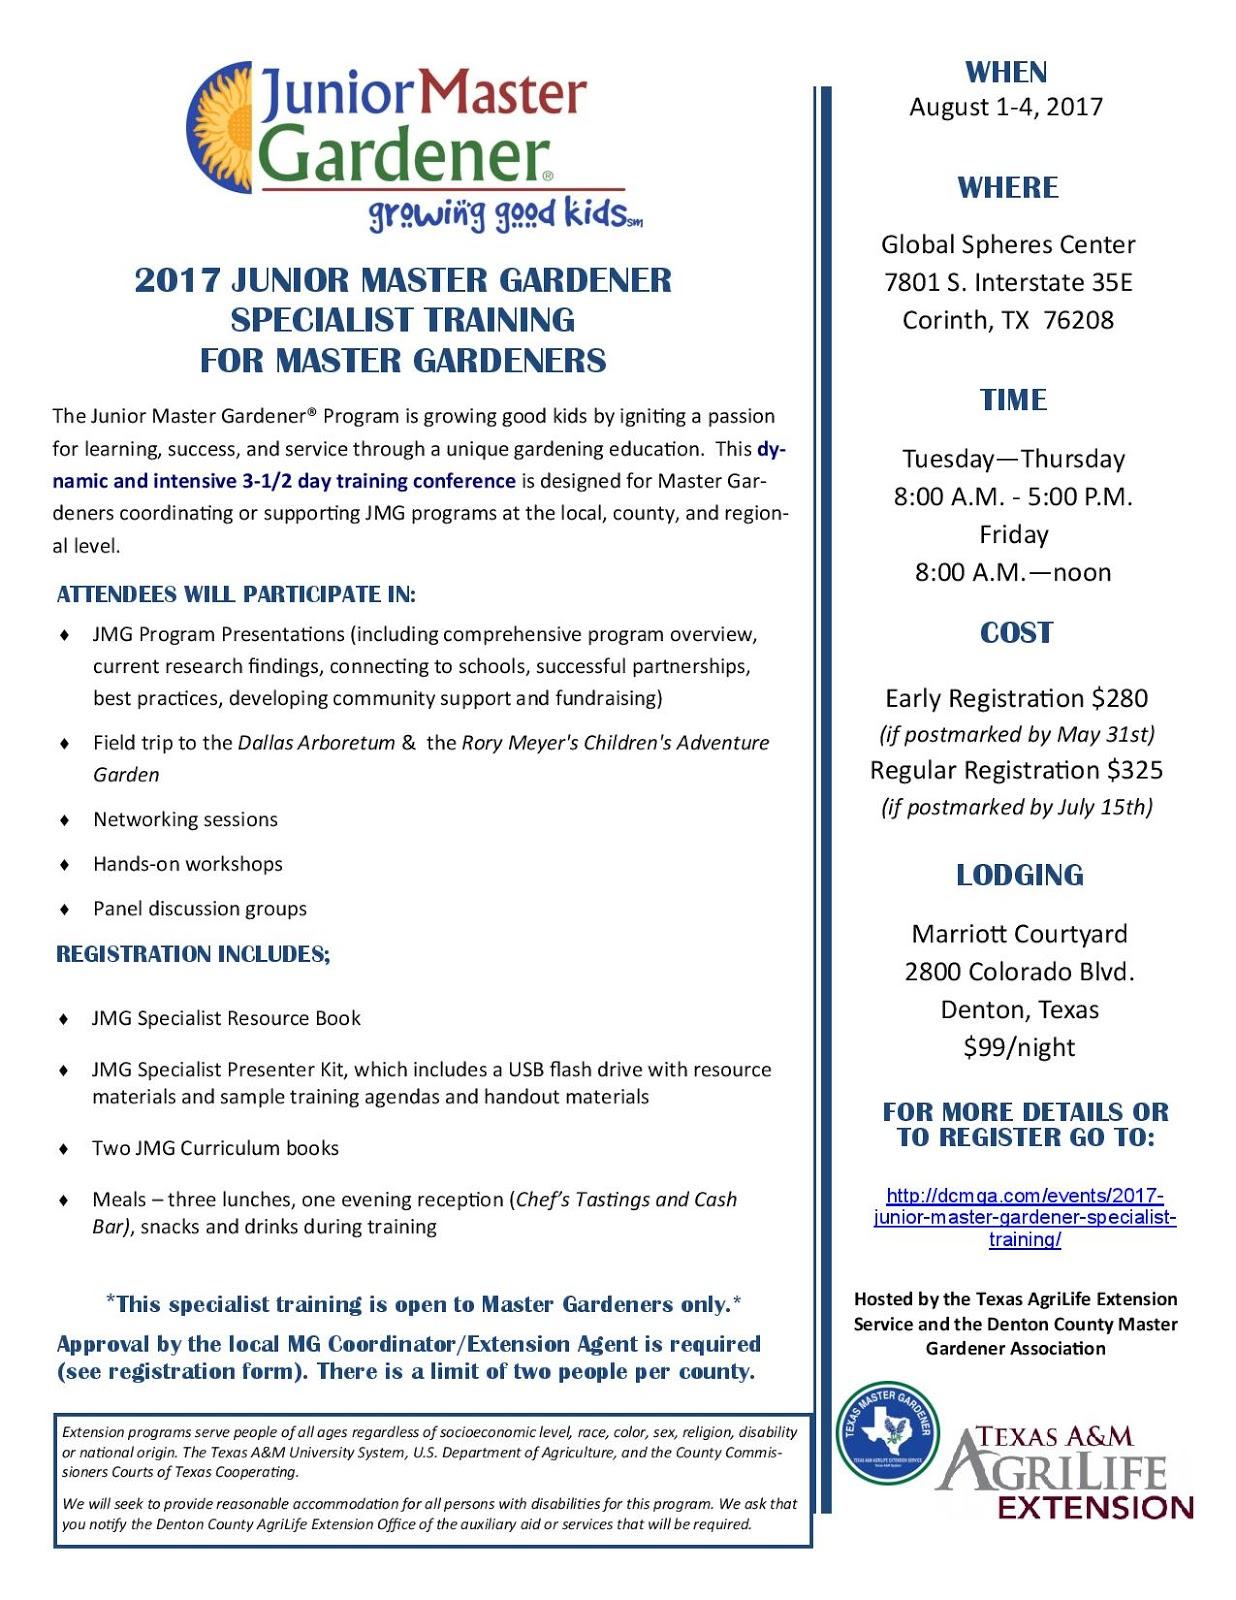 Virginia Cooperative Extension Master Gardener Program 2017 Junior Master Gardener Specialist